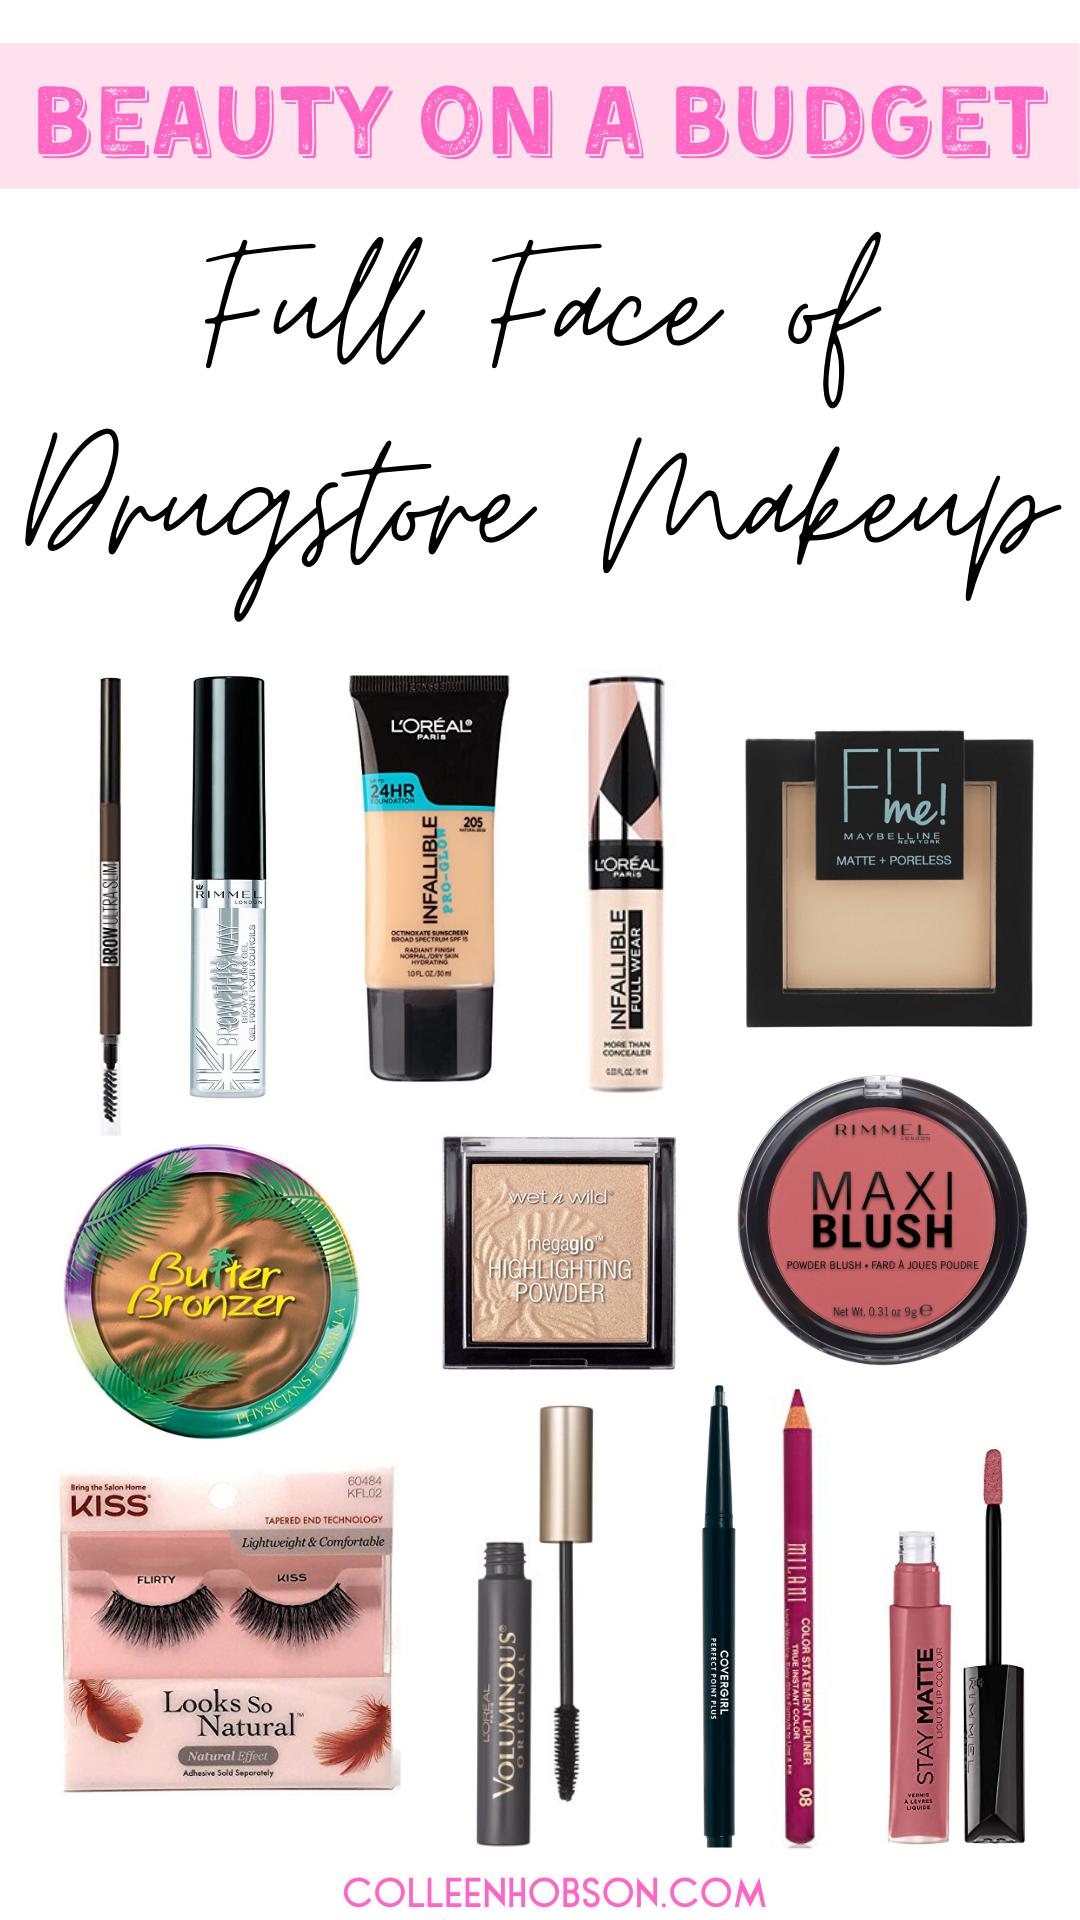 Drugstore Makeup Routine Full Face Tutorial Colleen Hobson In 2020 Drugstore Makeup Tutorial Drugstore Makeup Good Drugstore Bronzer